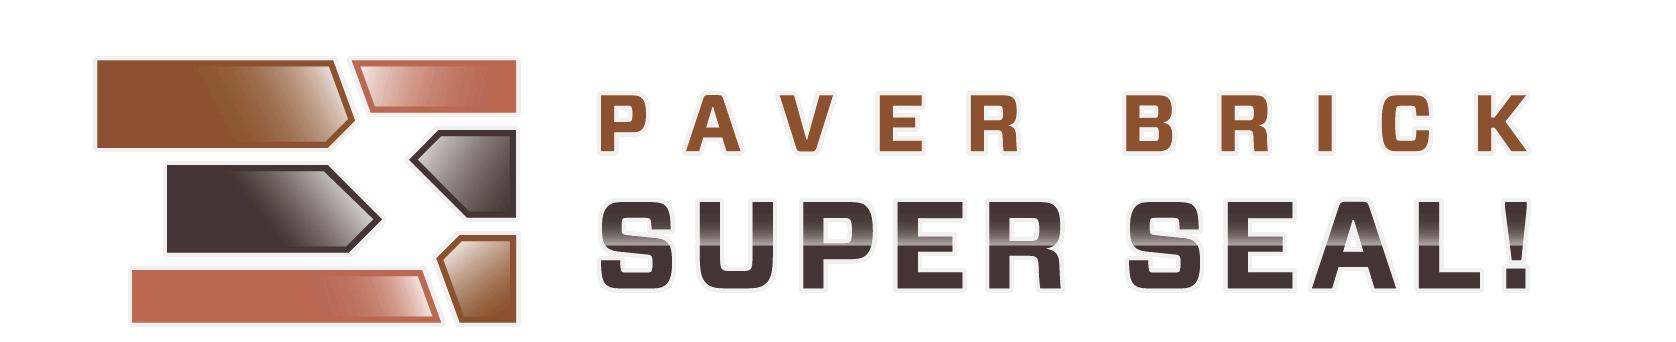 paver-brick-super-seal-logo